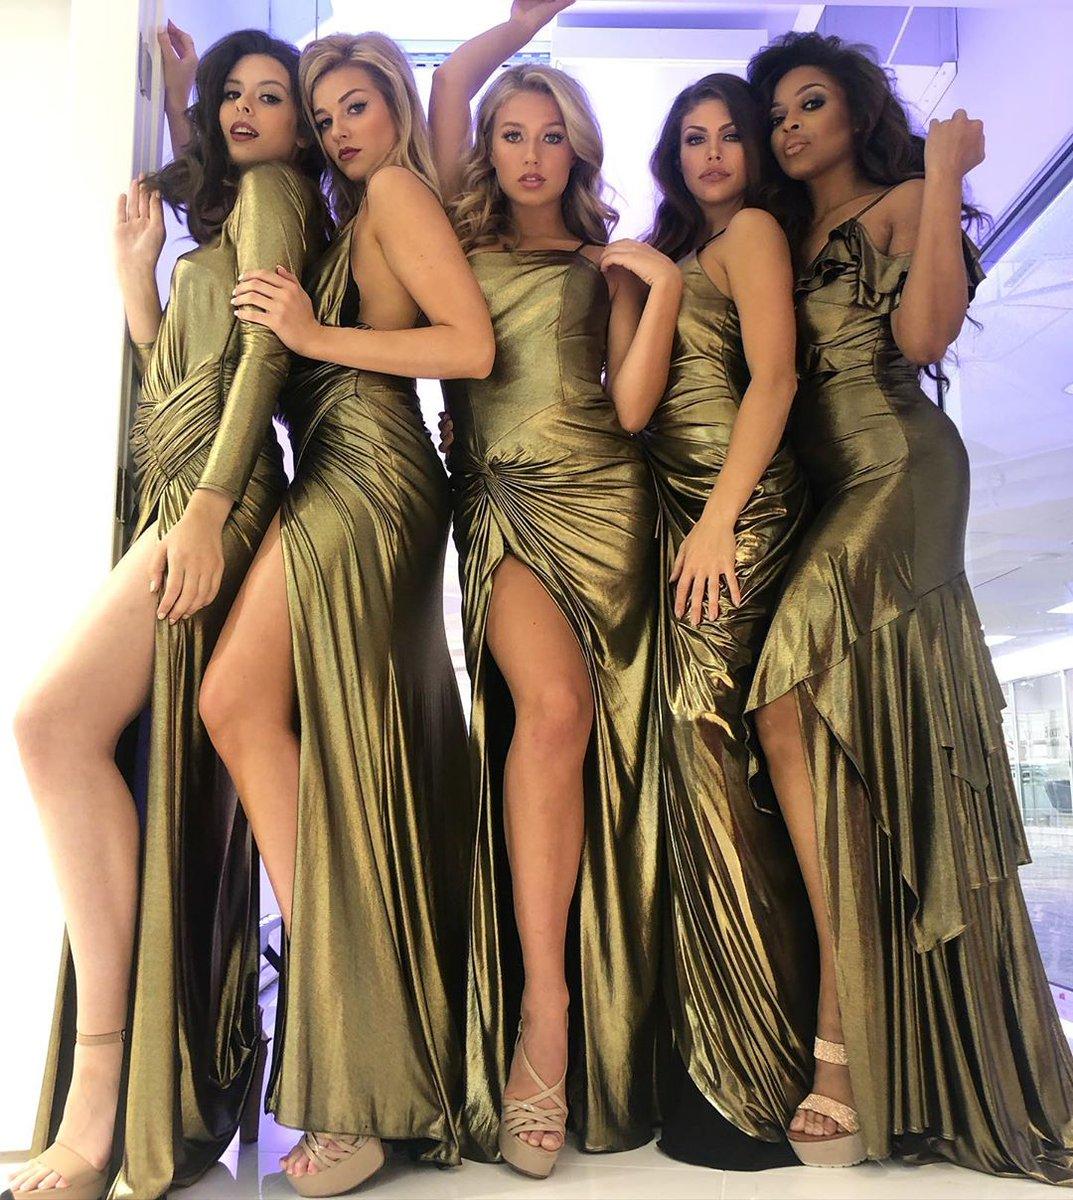 Golden Goddesses ✨⭐ #JOVANI #Prom2020  Shop metallic dresses ➡️ https://t.co/SRsJn18ZQ8 https://t.co/F9vz4y9fA2